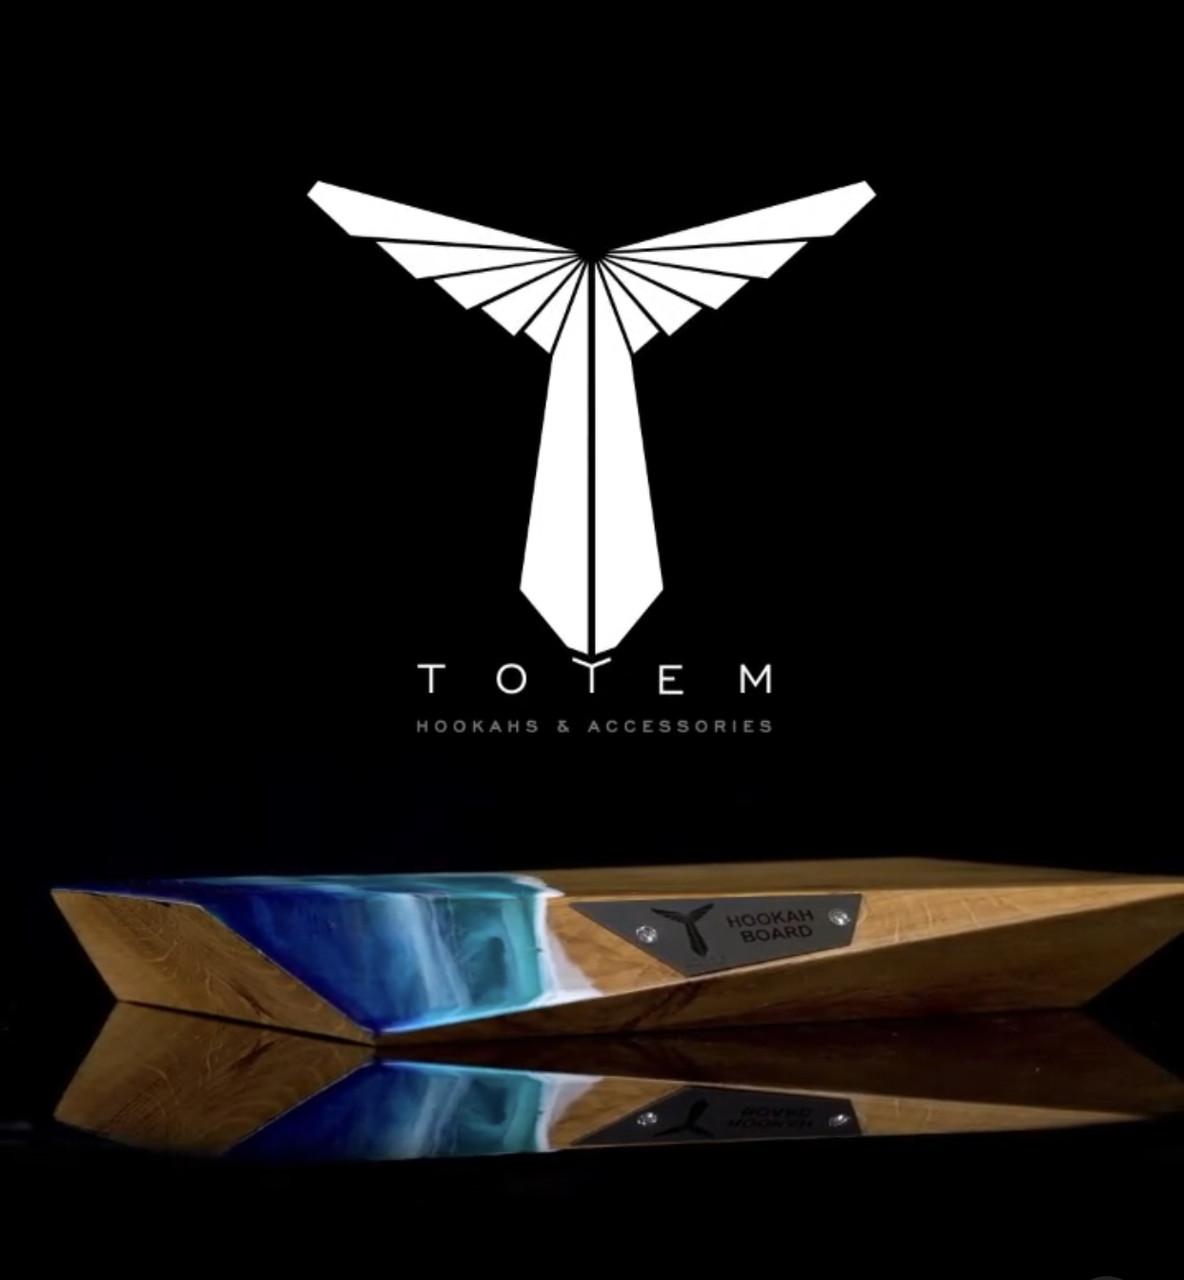 Дошка для приготування кальяну Totem Hookah - Board Edge Ocean Wave (Тотем)